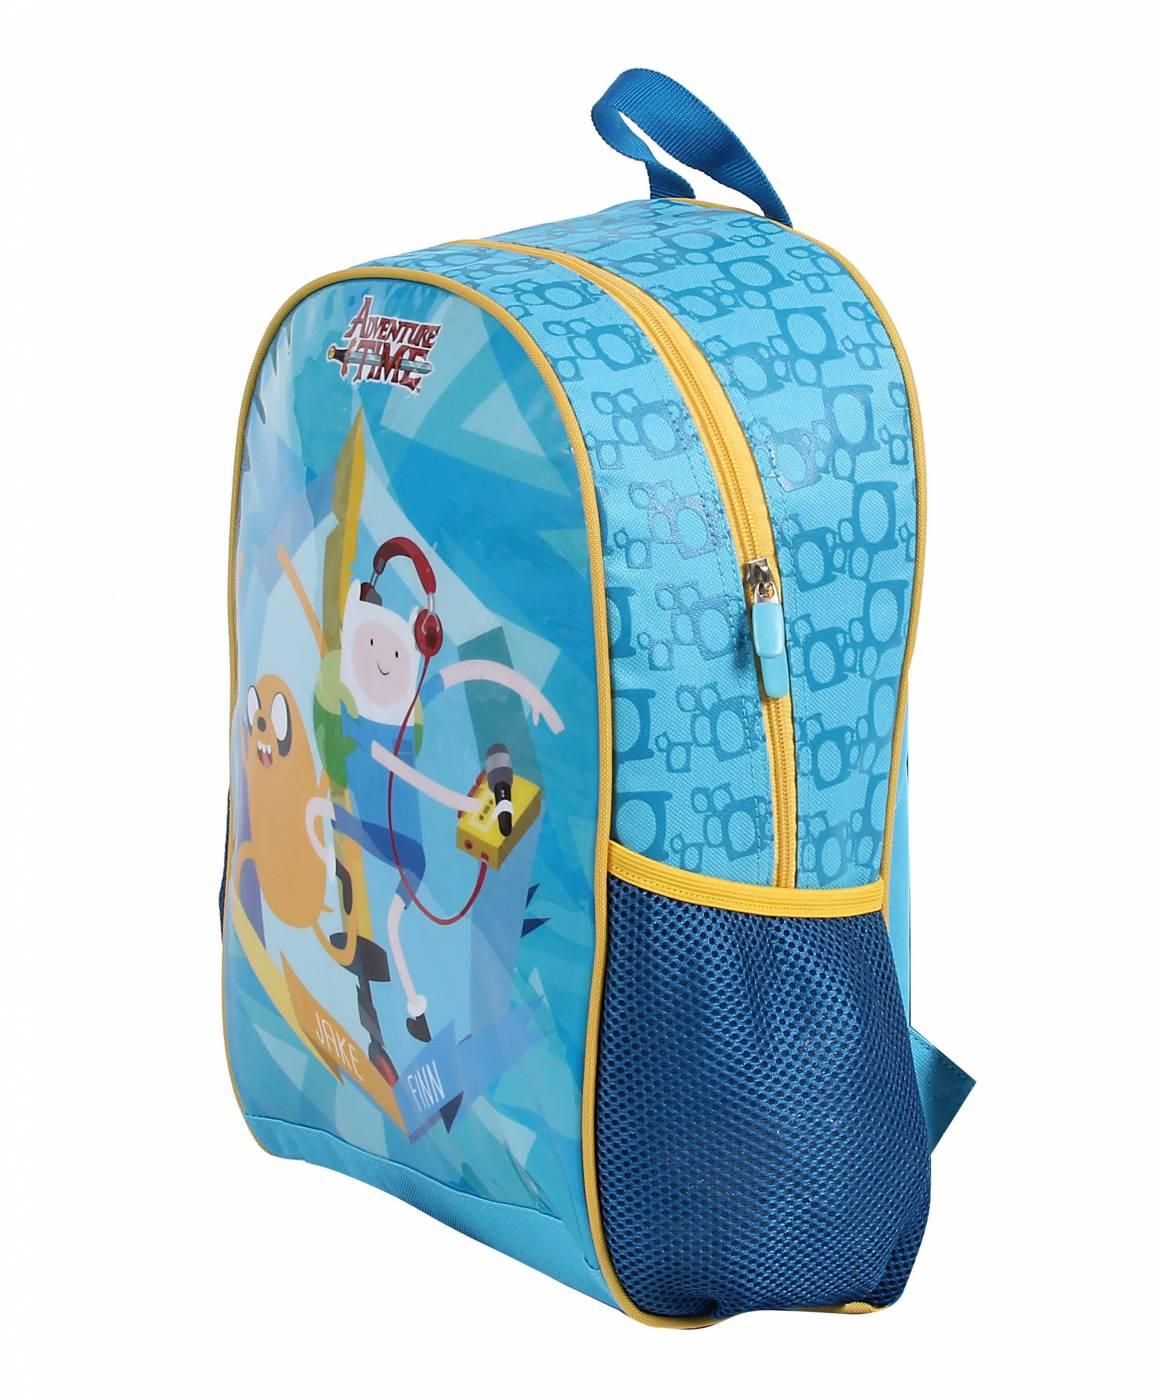 Mochila Grande DMW Adventure Time 49027